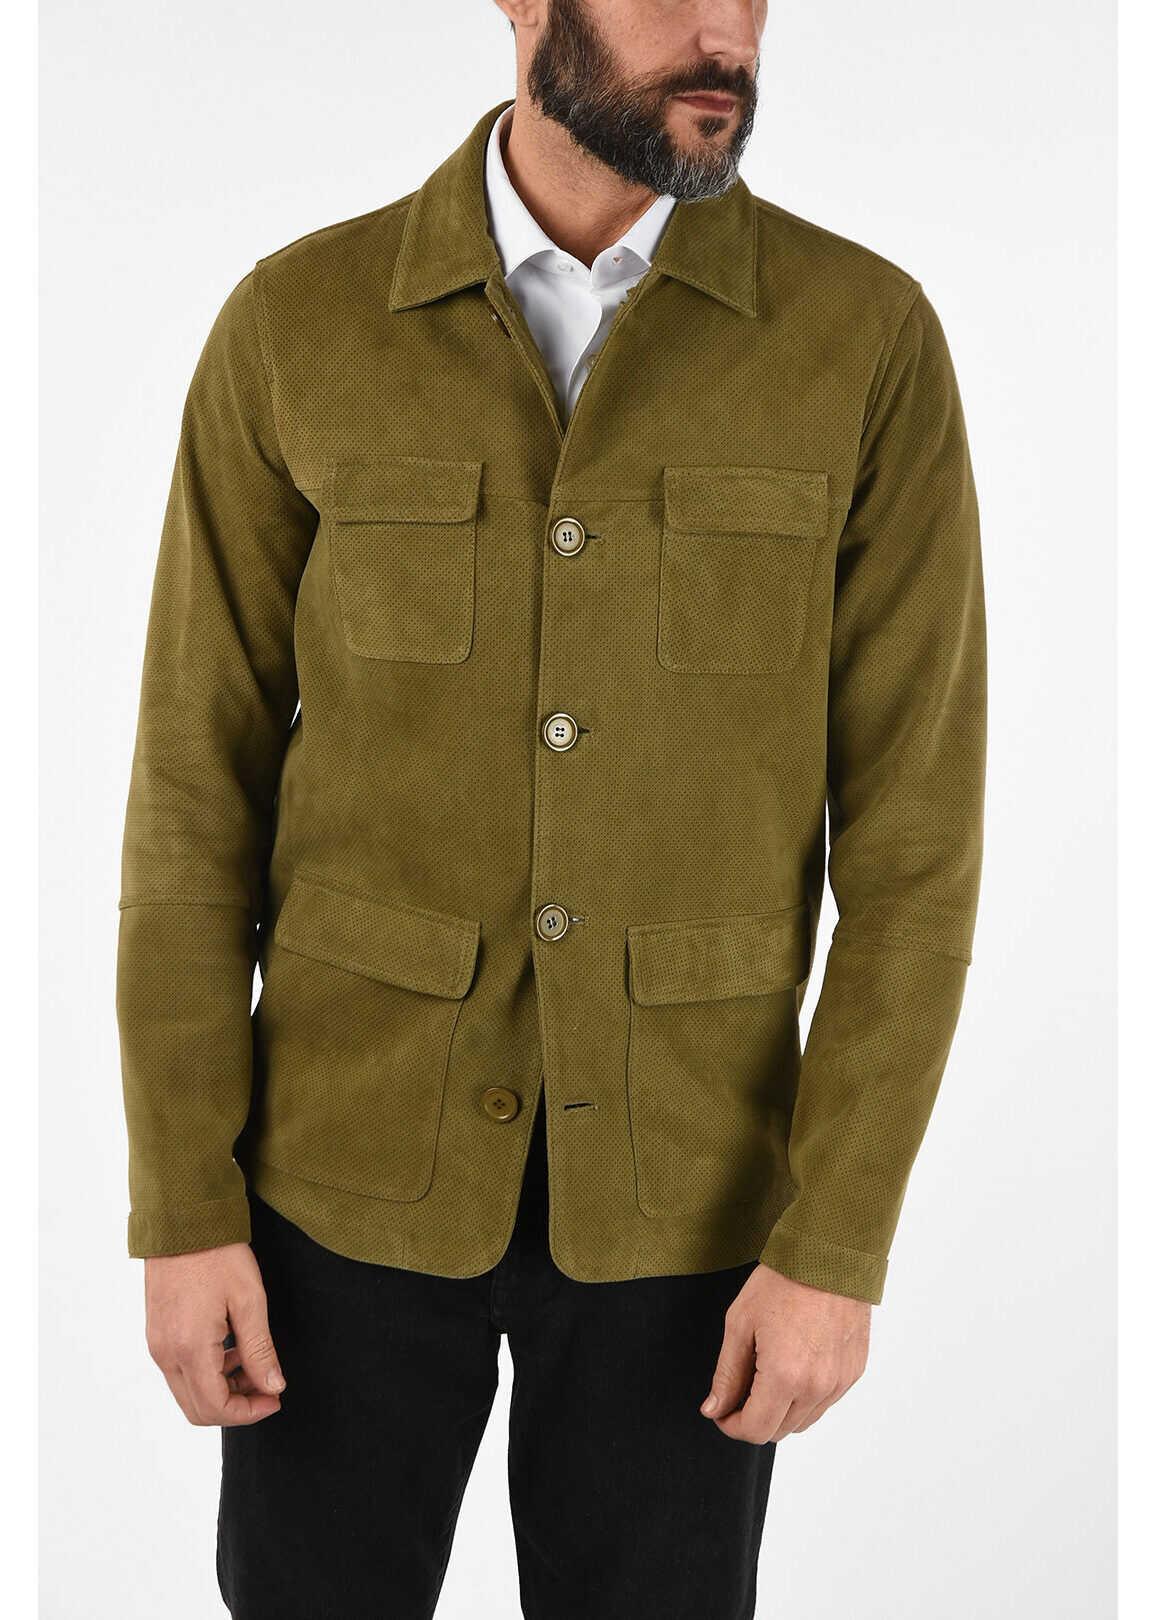 CORNELIANI CC COLLECTION O.WEAR Leather PERFORATED Jacket GREEN imagine